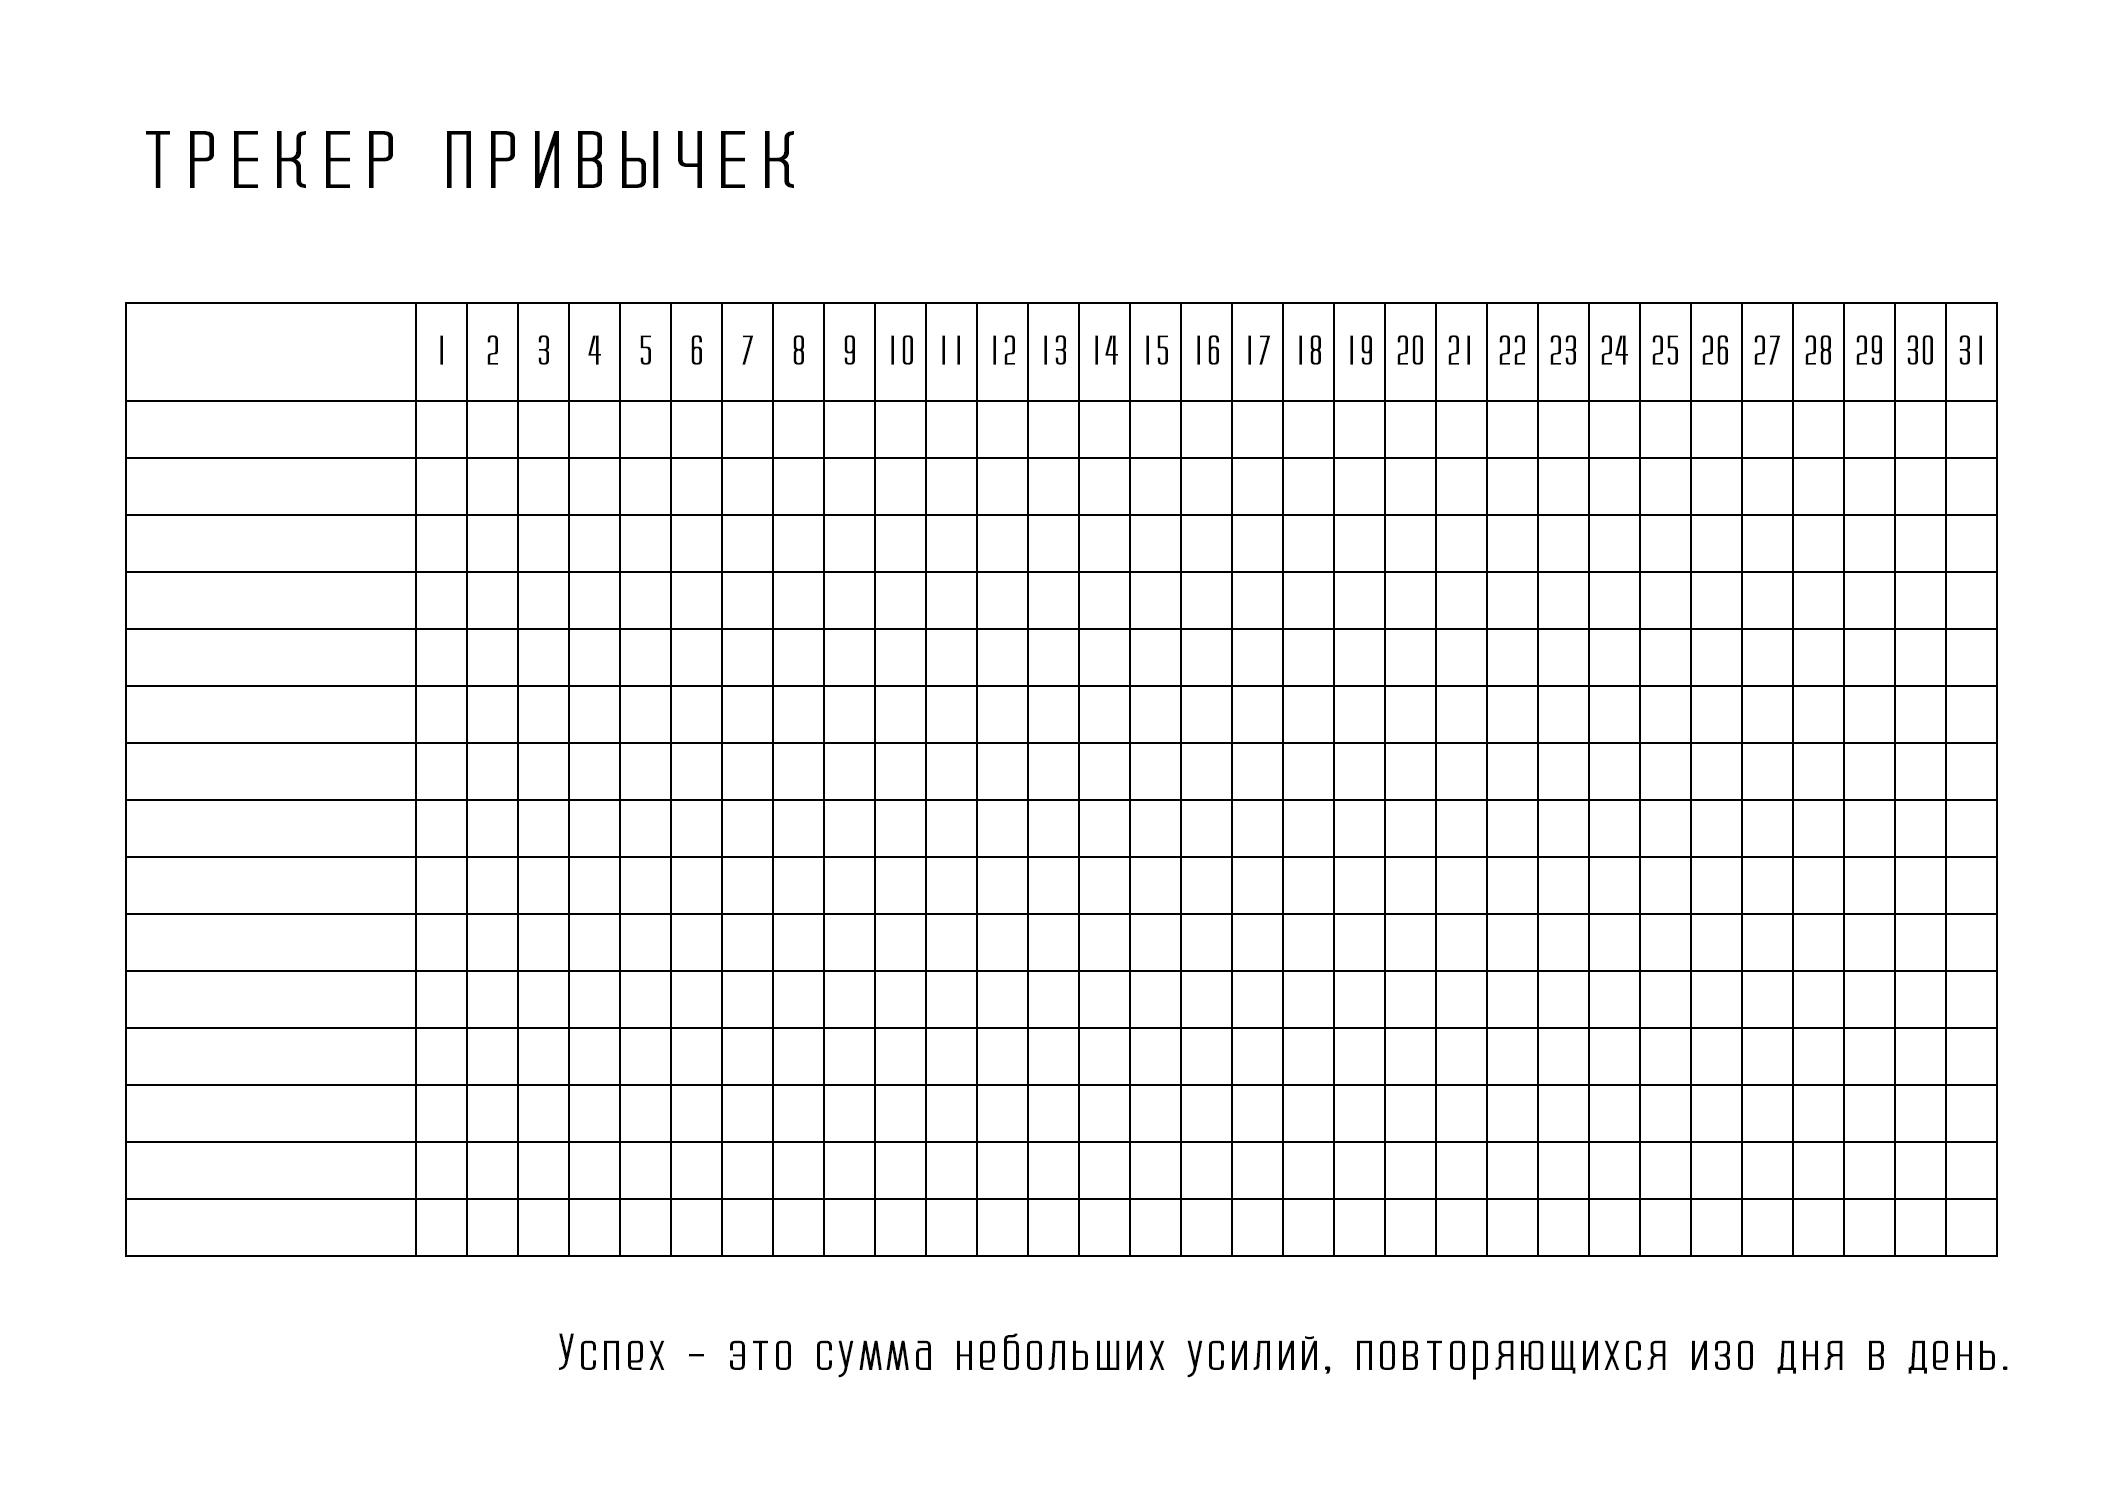 трекер привычек 21 district-f.org 1